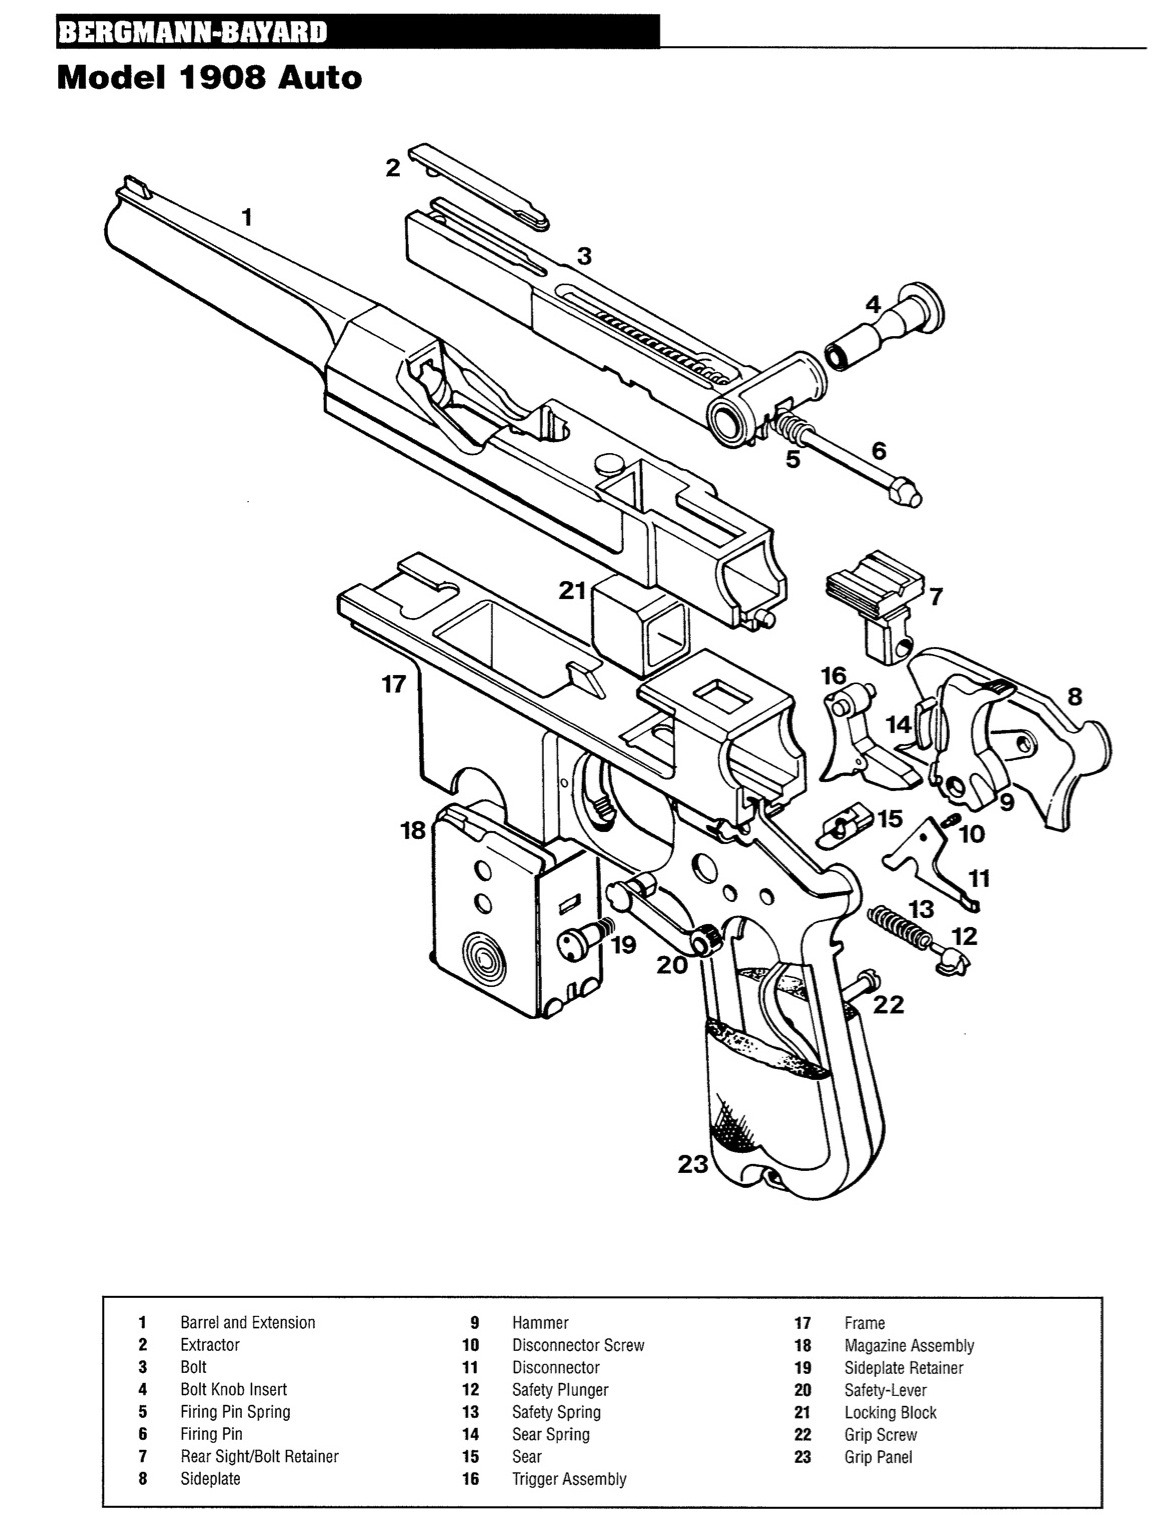 Colt 45 Revolver Drawing At Getdrawings